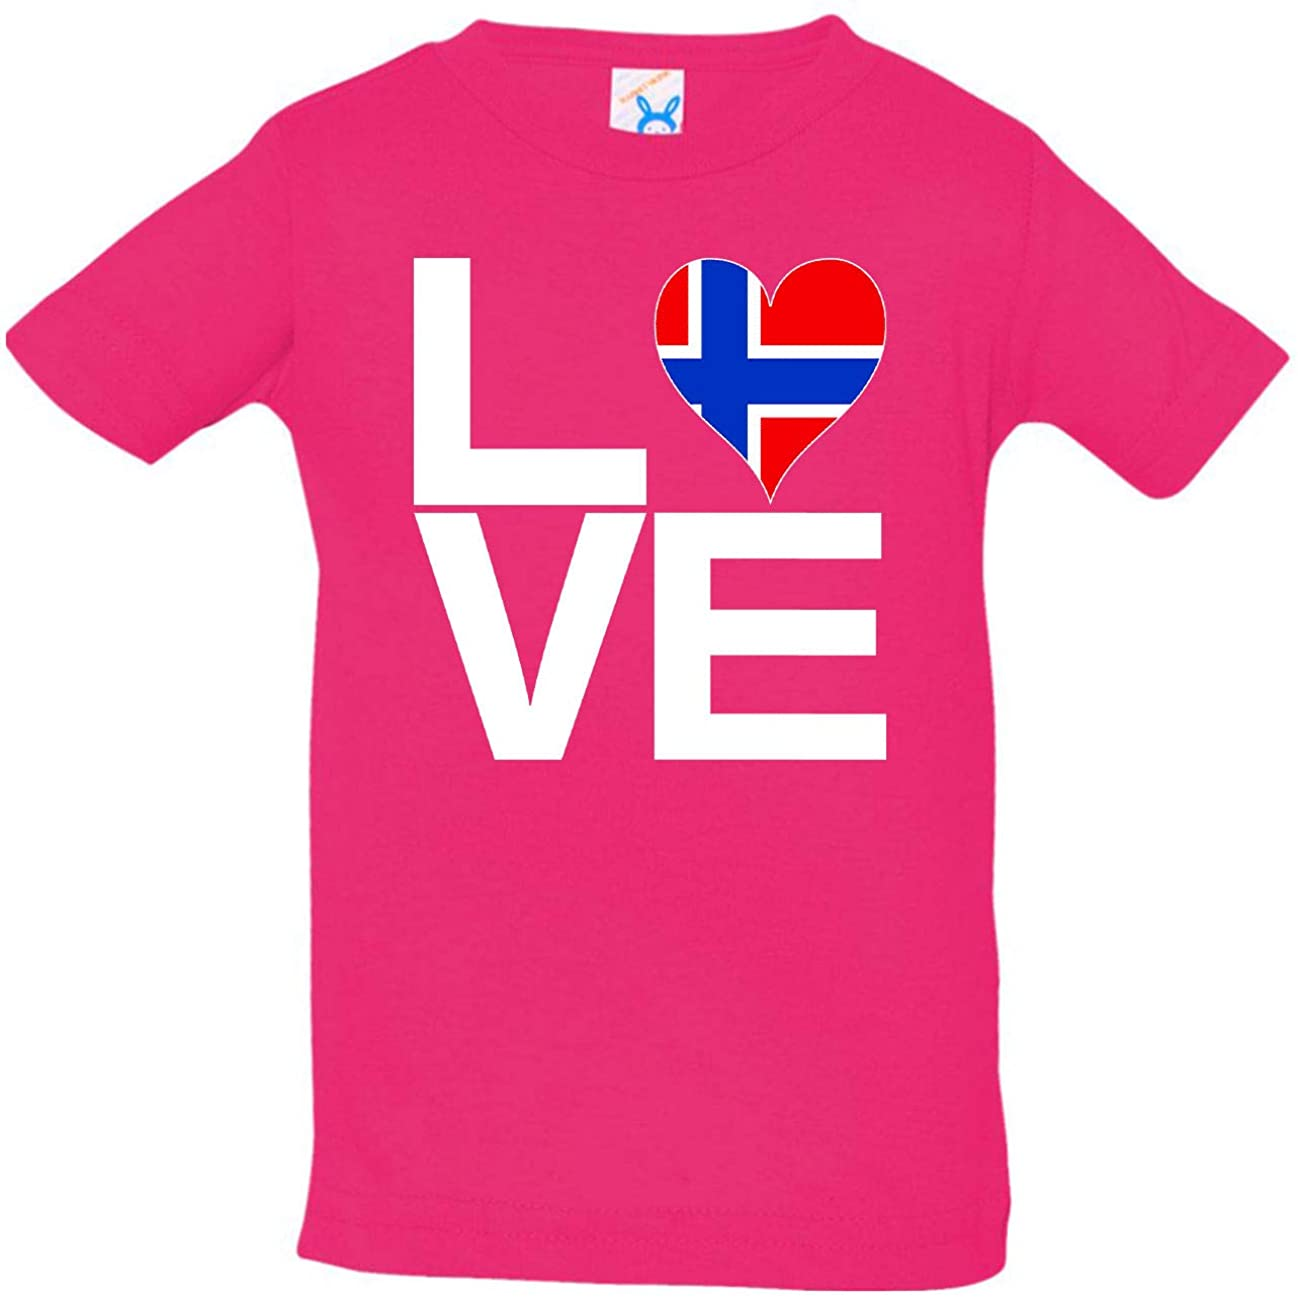 HARD EDGE DESIGN Infant's Love Block Norway Heart Shirt, 12 Months, Hot Pink